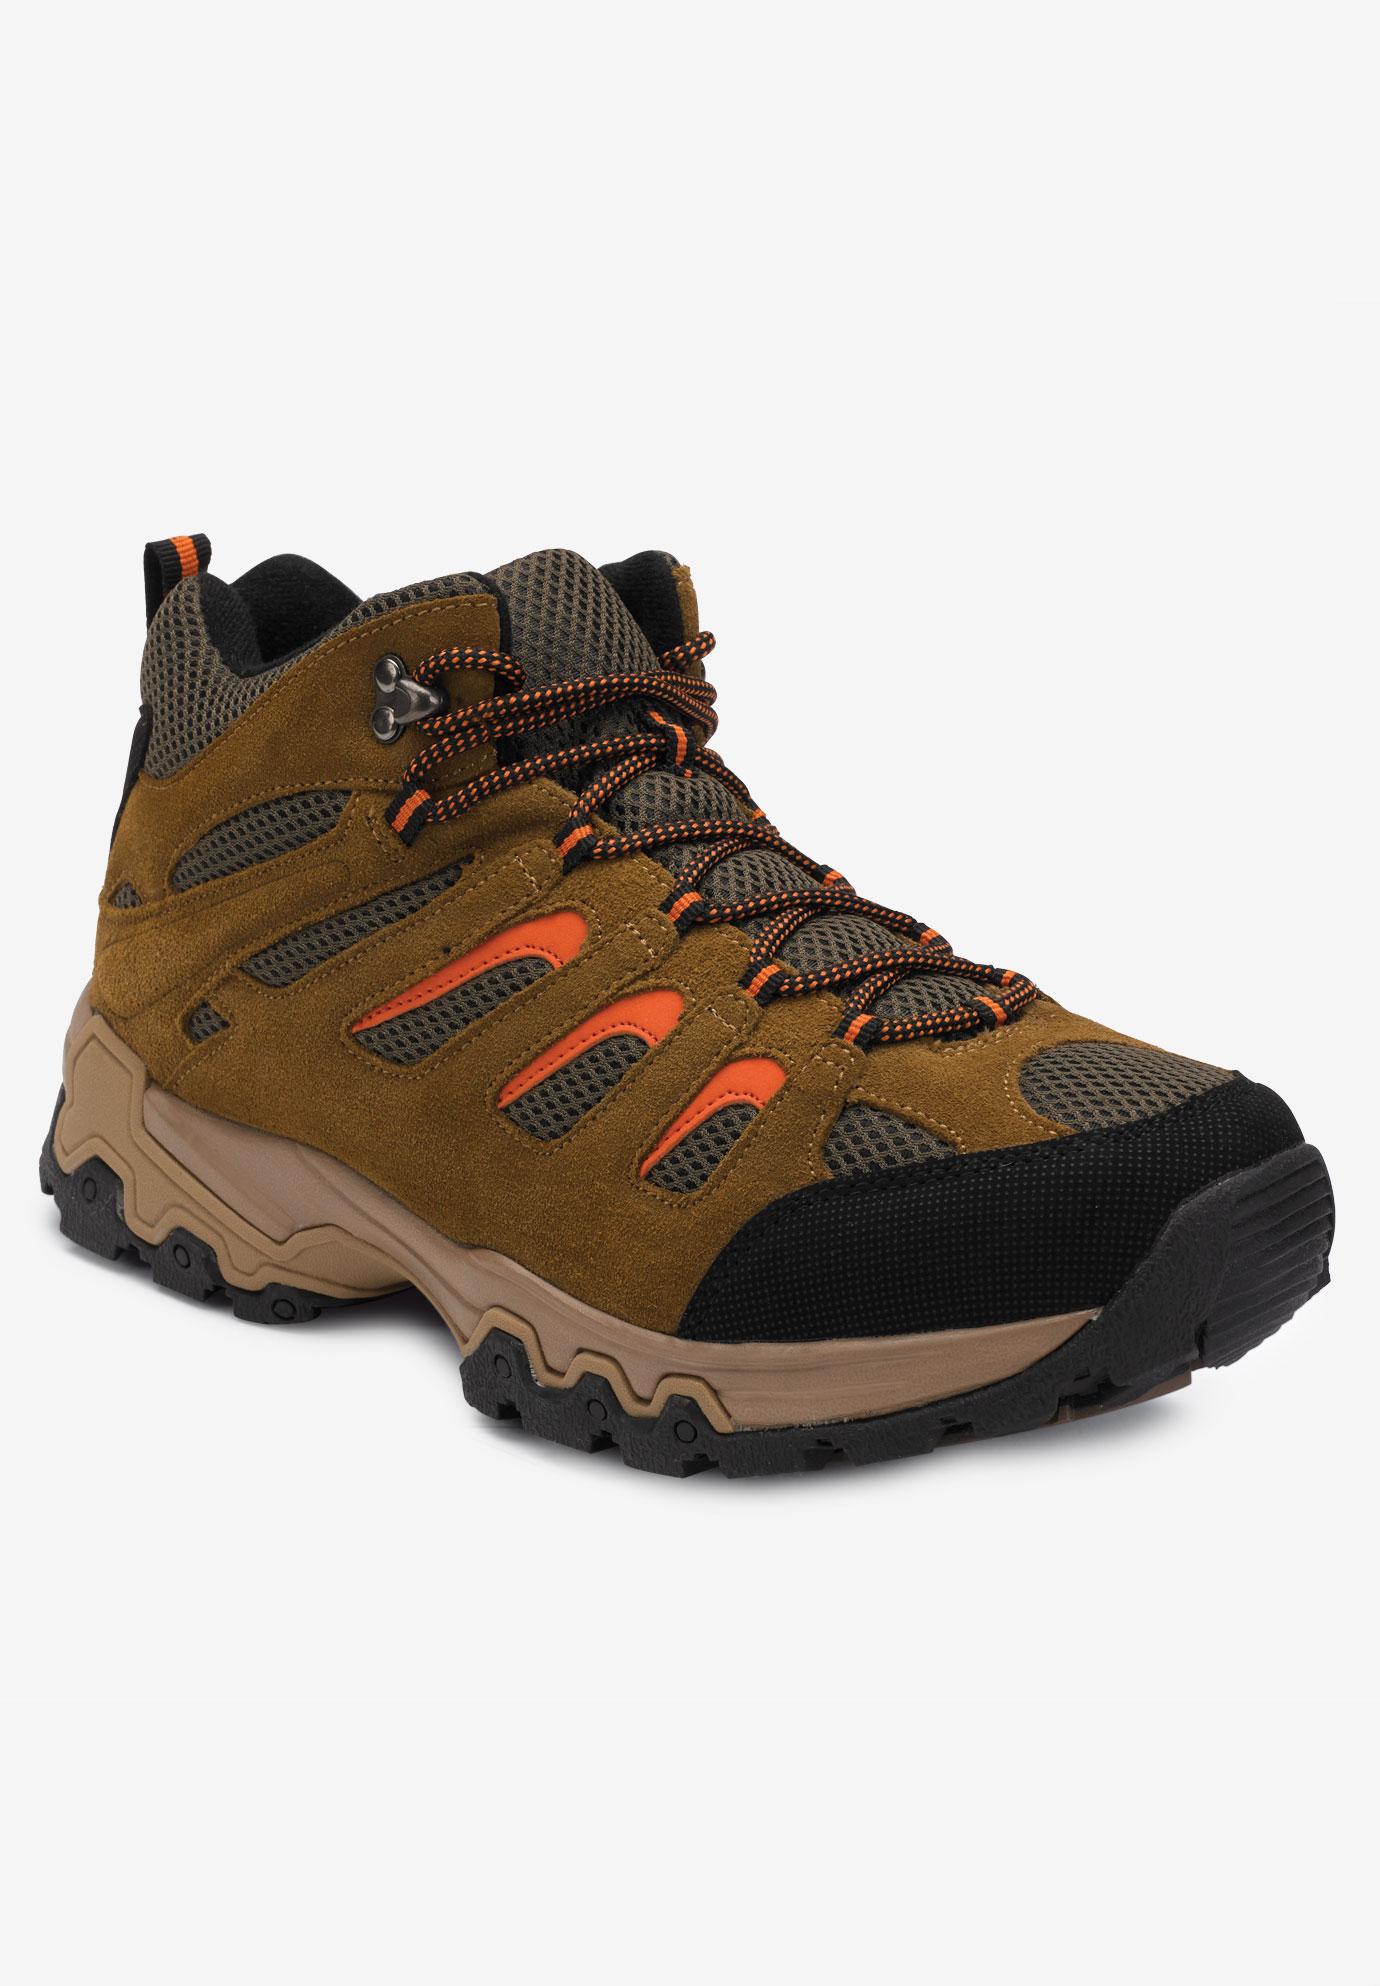 c7dd4599a26 Boulder Creek® Lace-up Hiking Boots